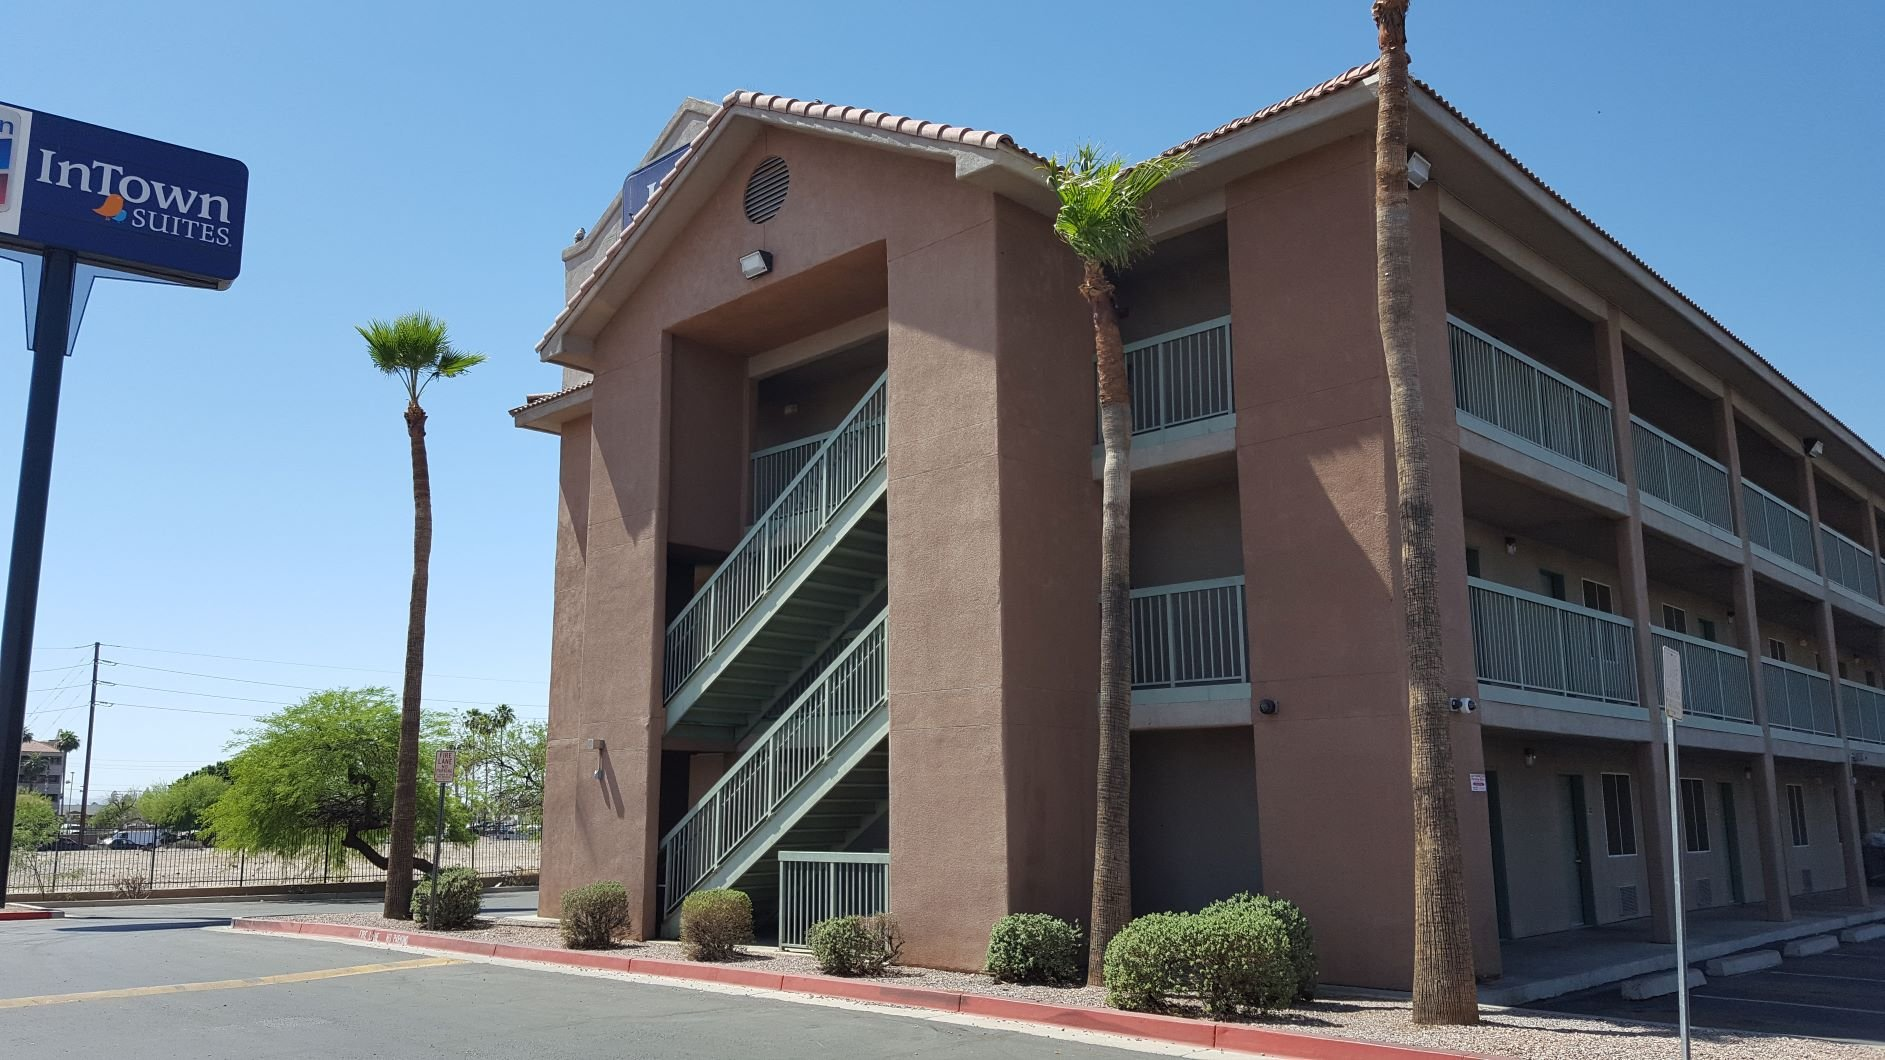 InTown Suites Extended Stay Phoenix AZ - Gilbert